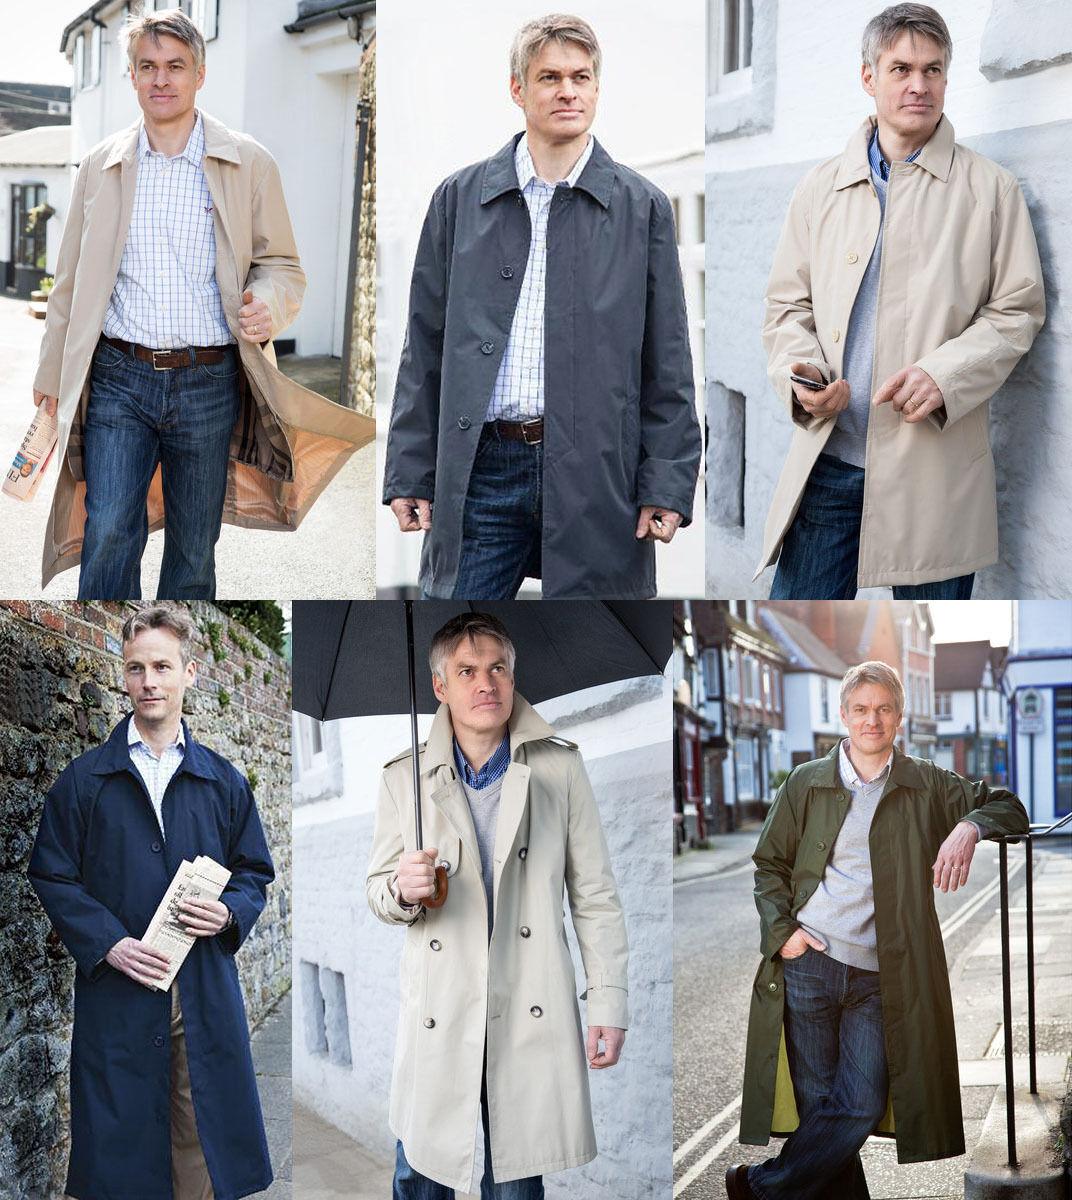 Men's Rainmac Waterproof Coats Full or ¾ Length Raincoats & Poncho Cape